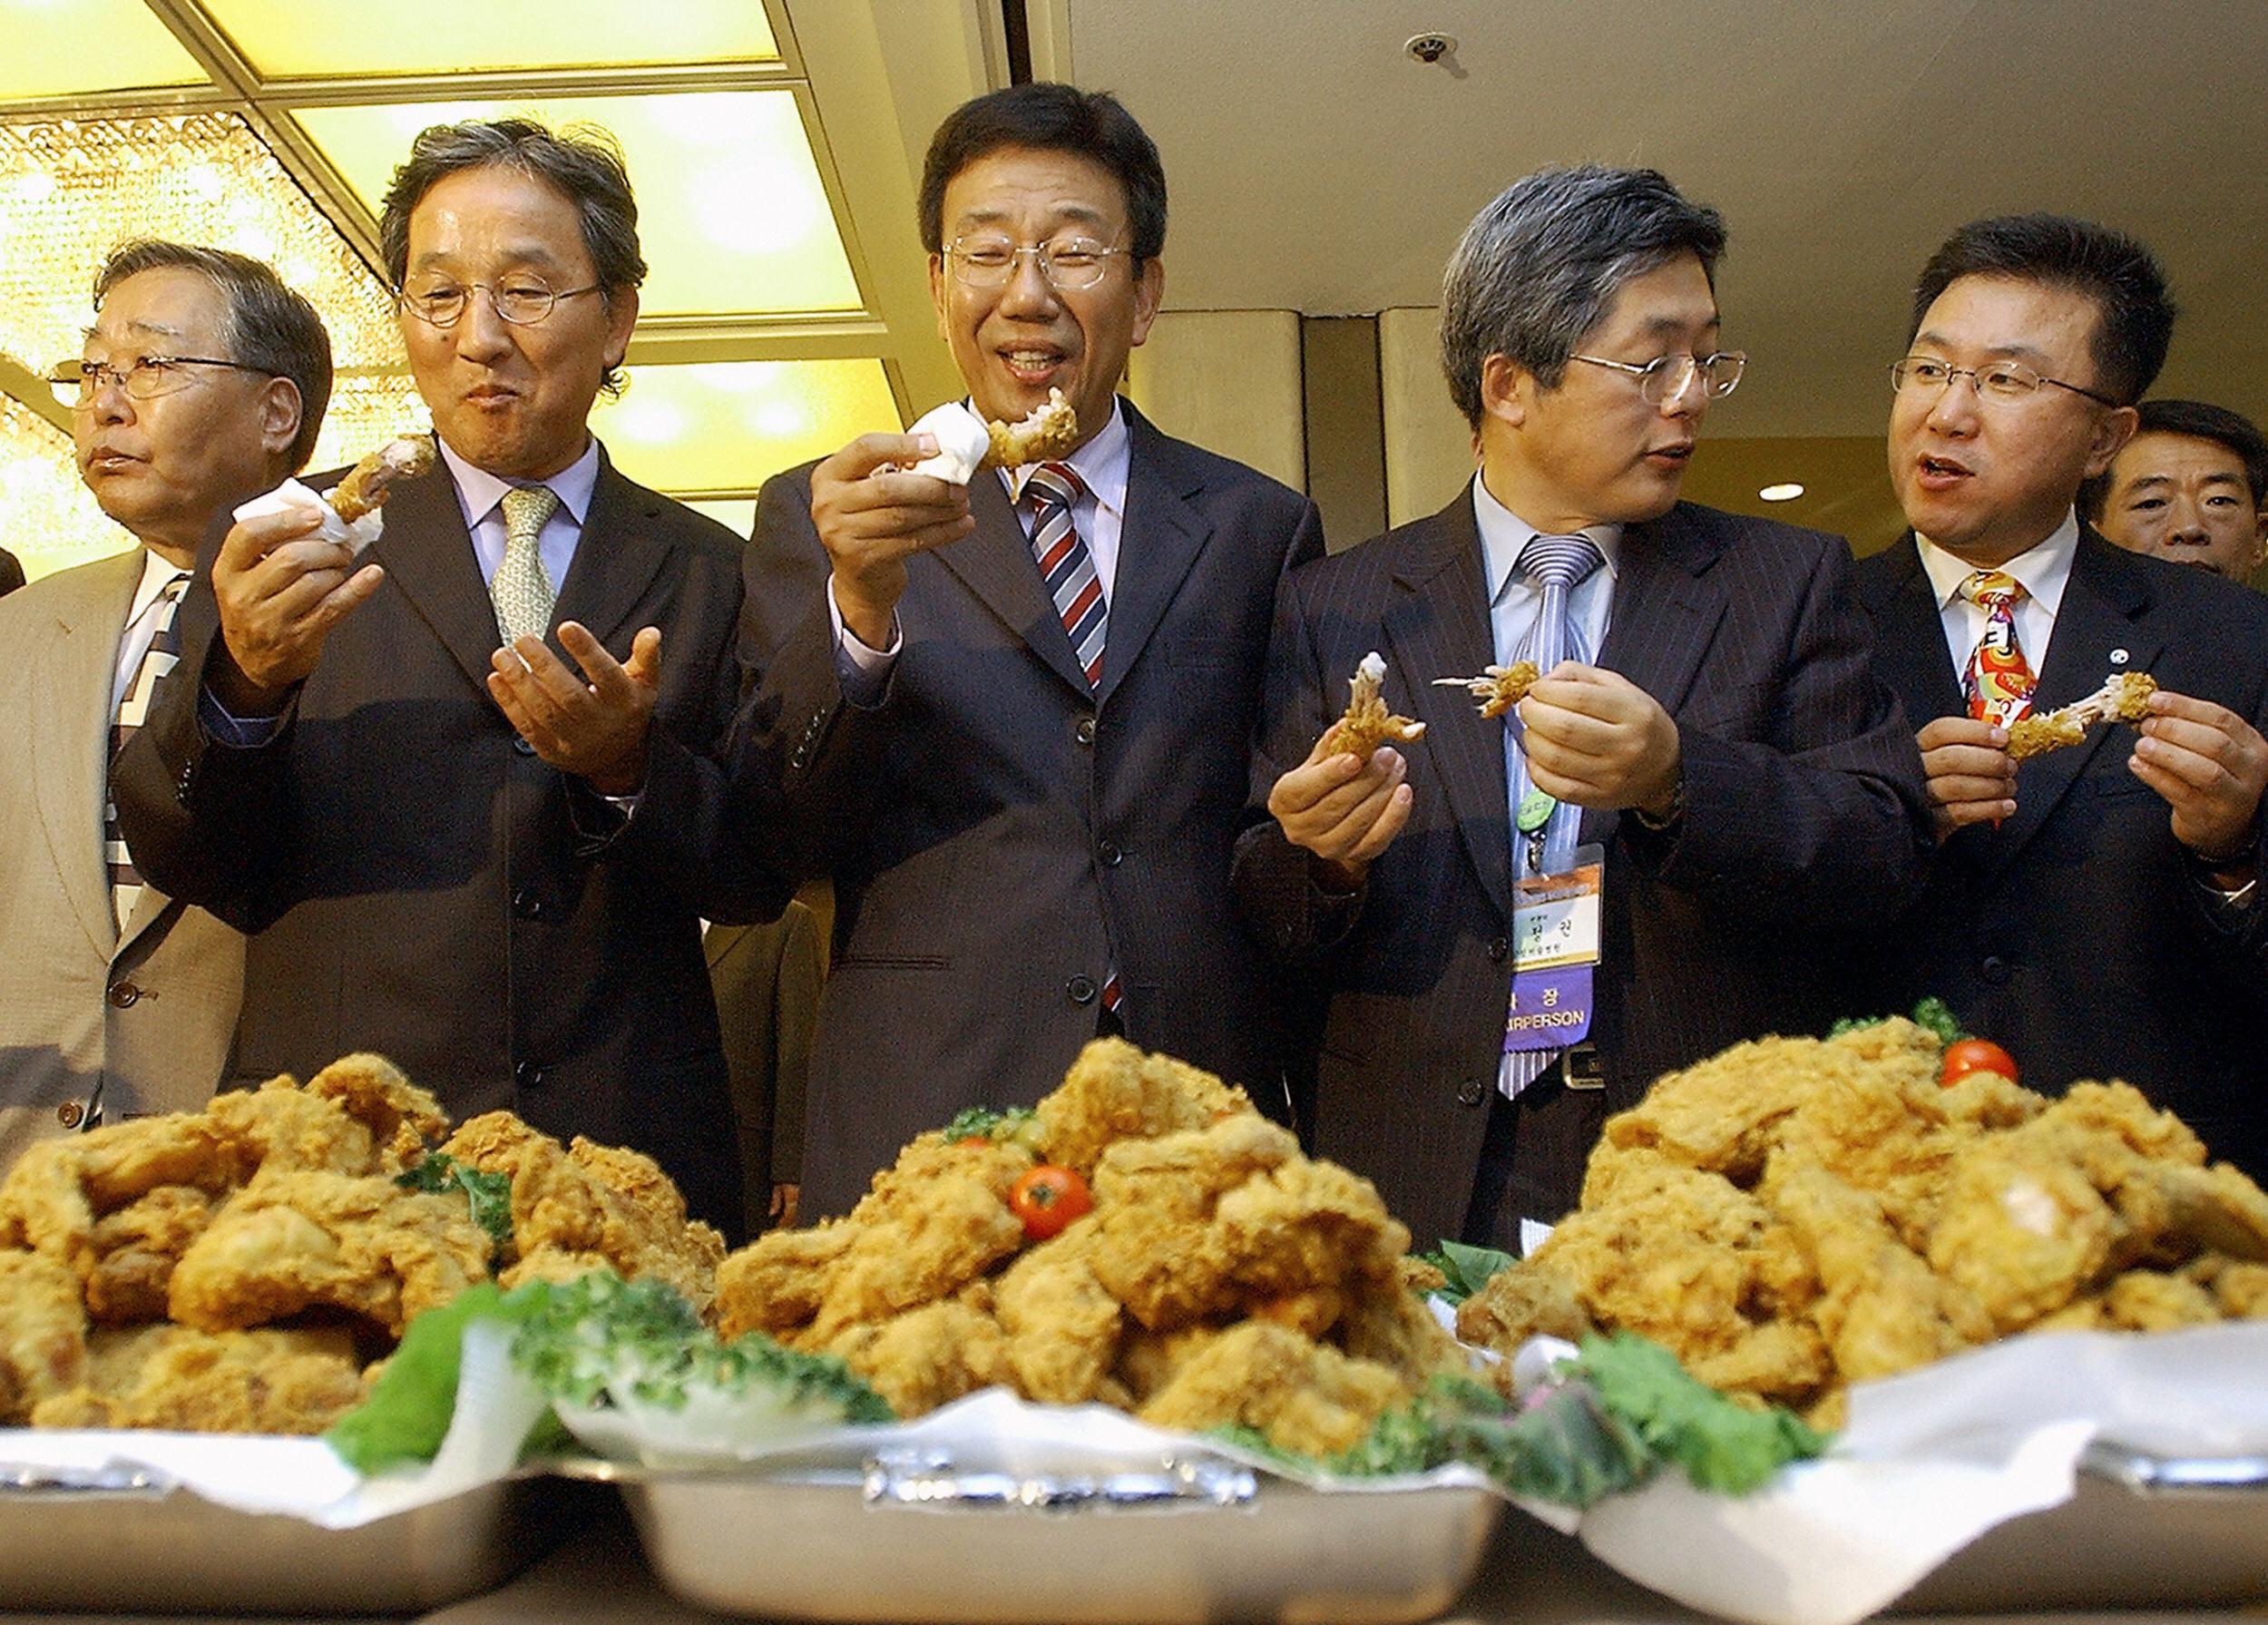 South Korea's Fried Chicken Craze Sparks Battle for Market Share | Fortune